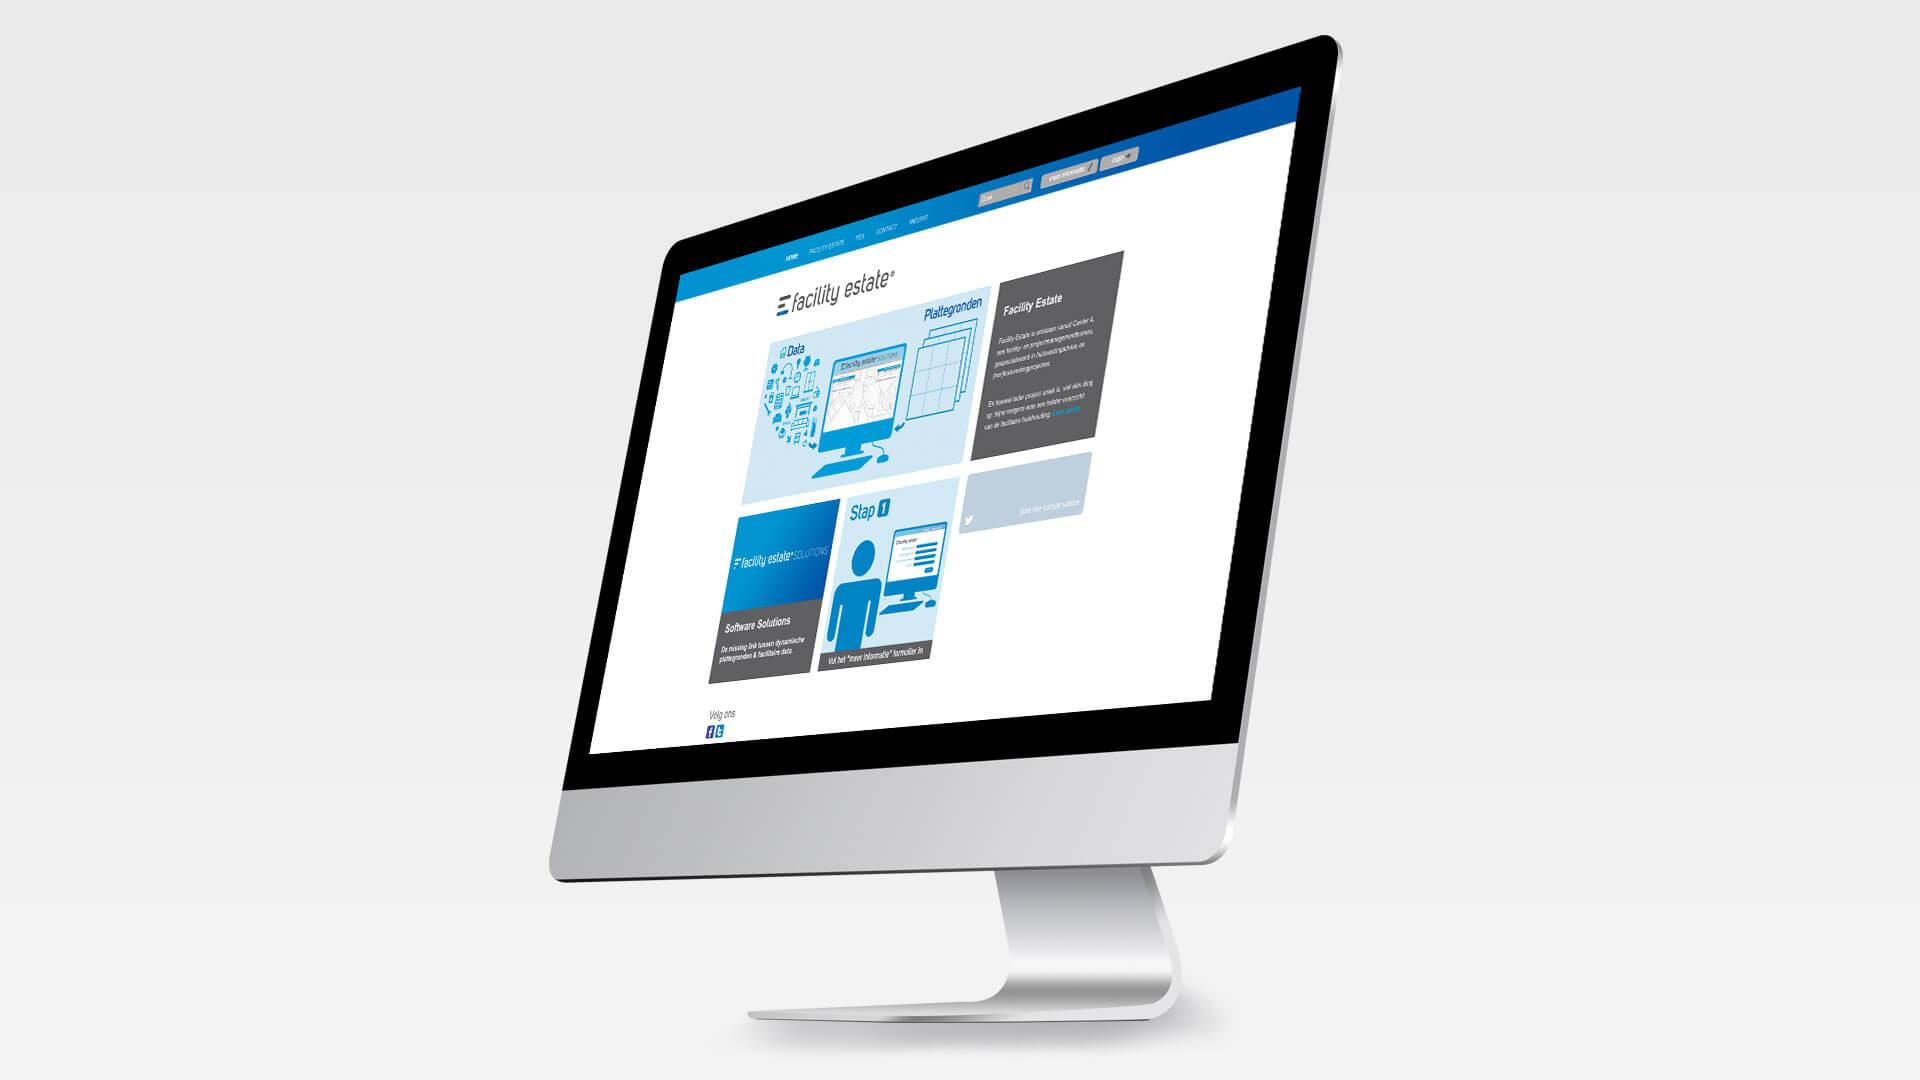 Webdesign_Facility-Estate-responsive